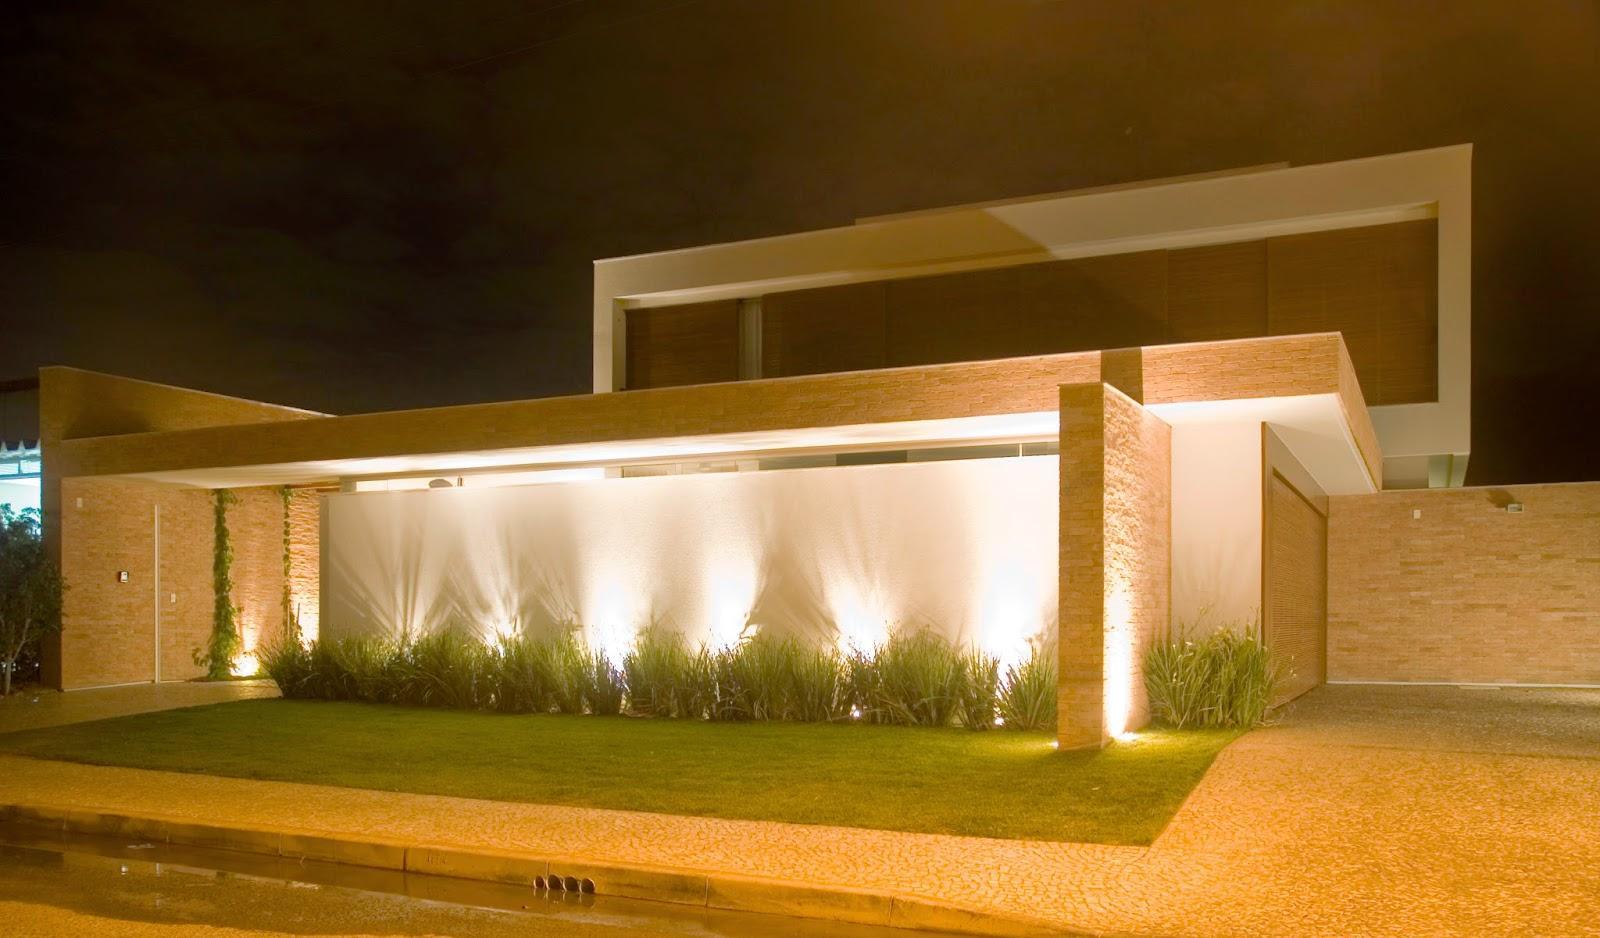 60 modelos de muros residenciais fachadas fotos e dicas for Iluminacion para muros exteriores